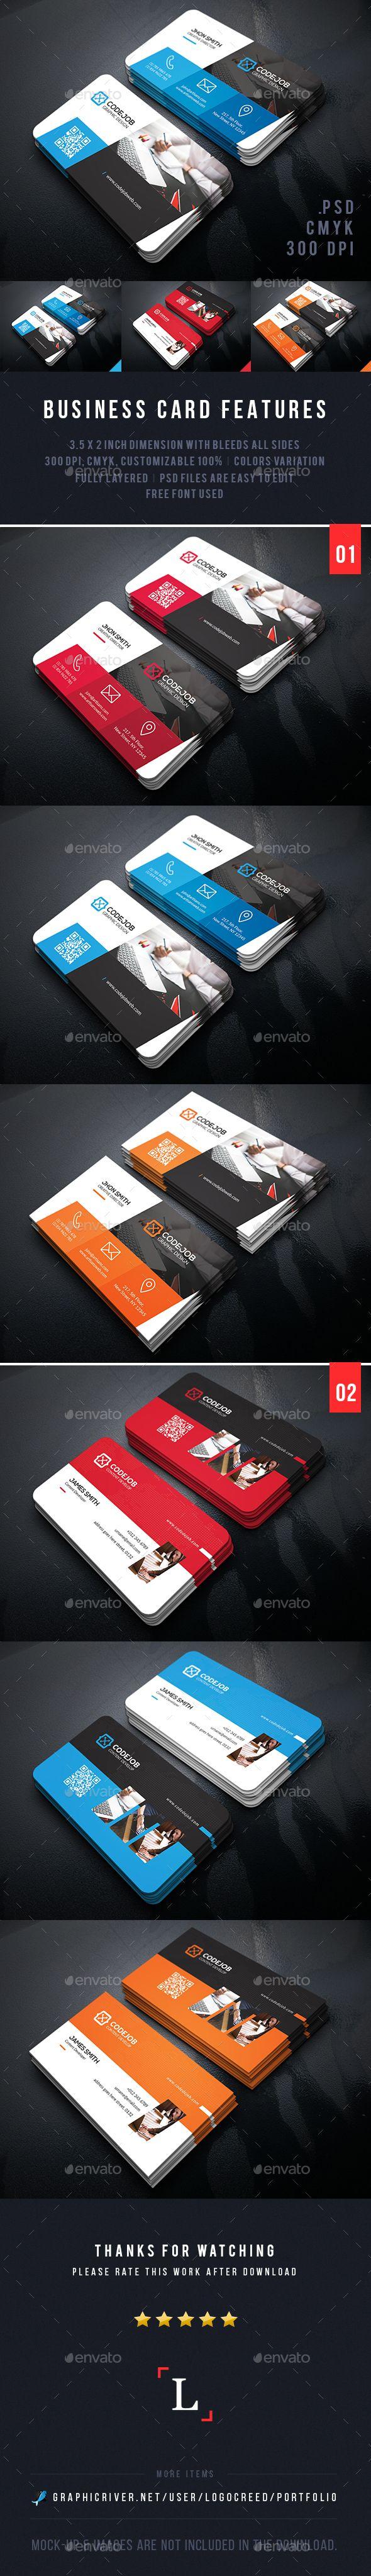 175 Best Design Ideas Business Cards Images On Pinterest Business